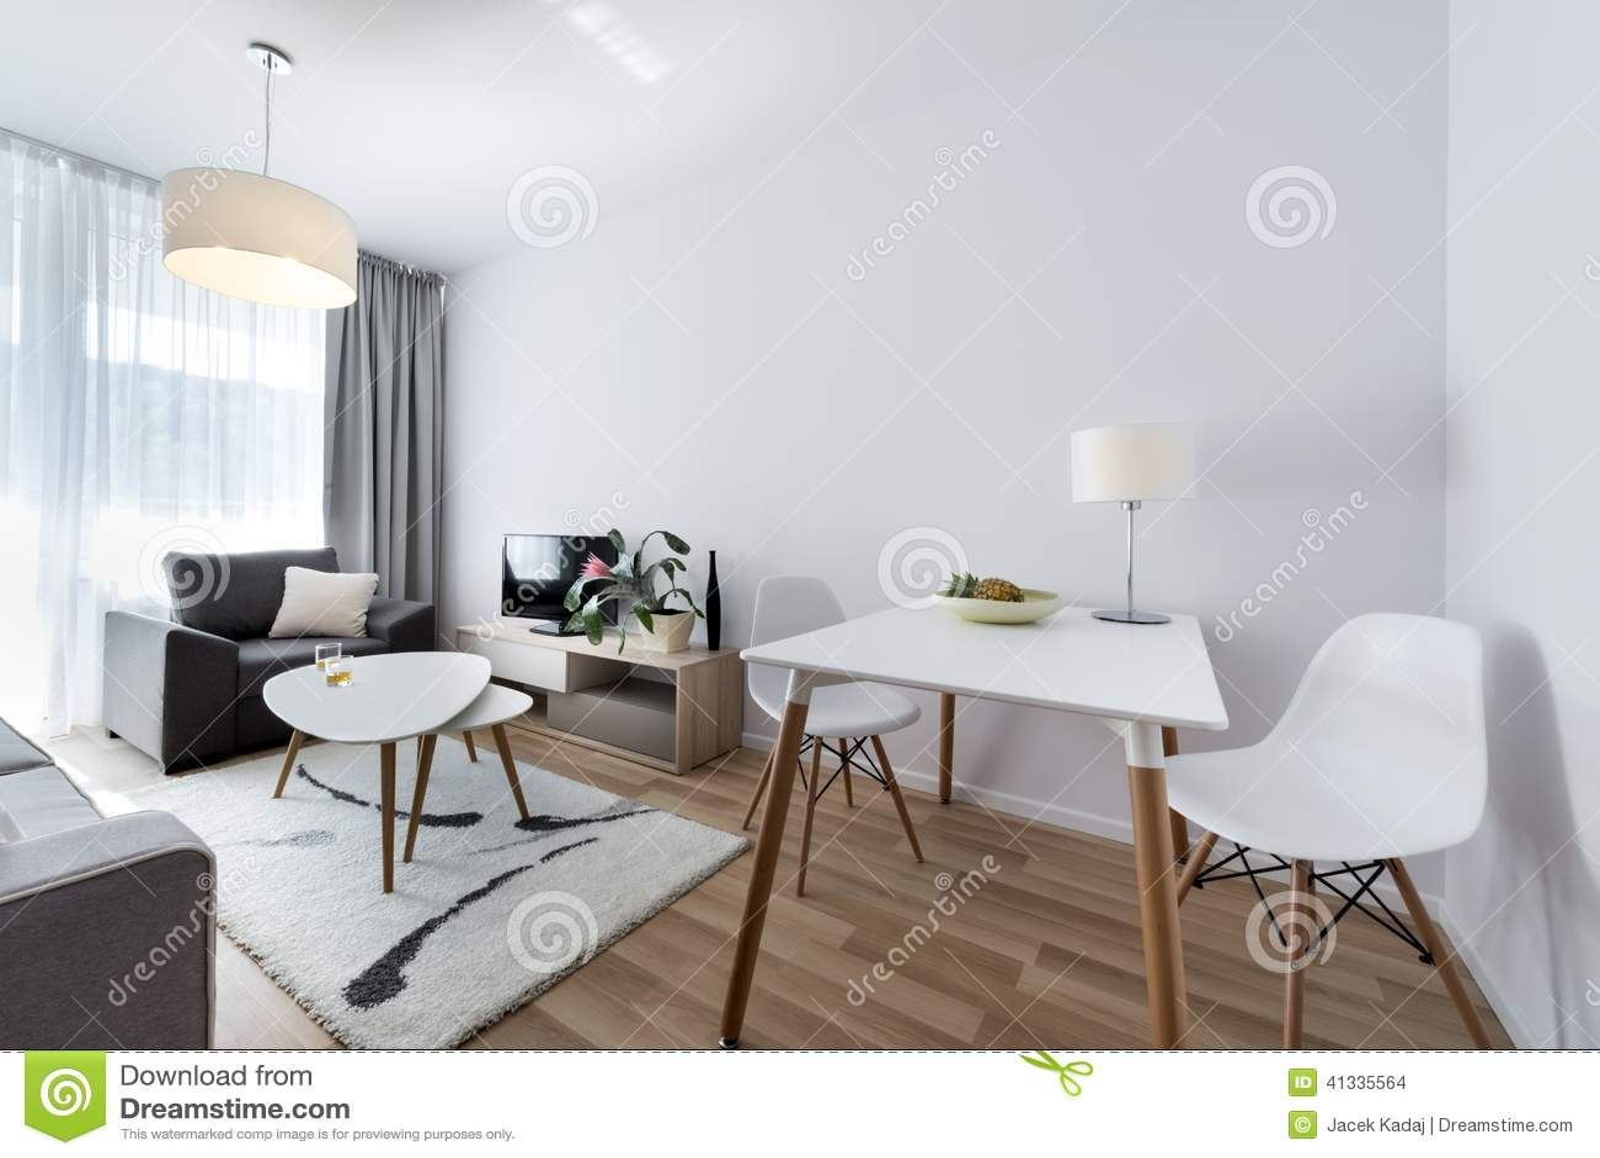 Modern interior design room in scandinavian style stock - Table ronde style scandinave ...